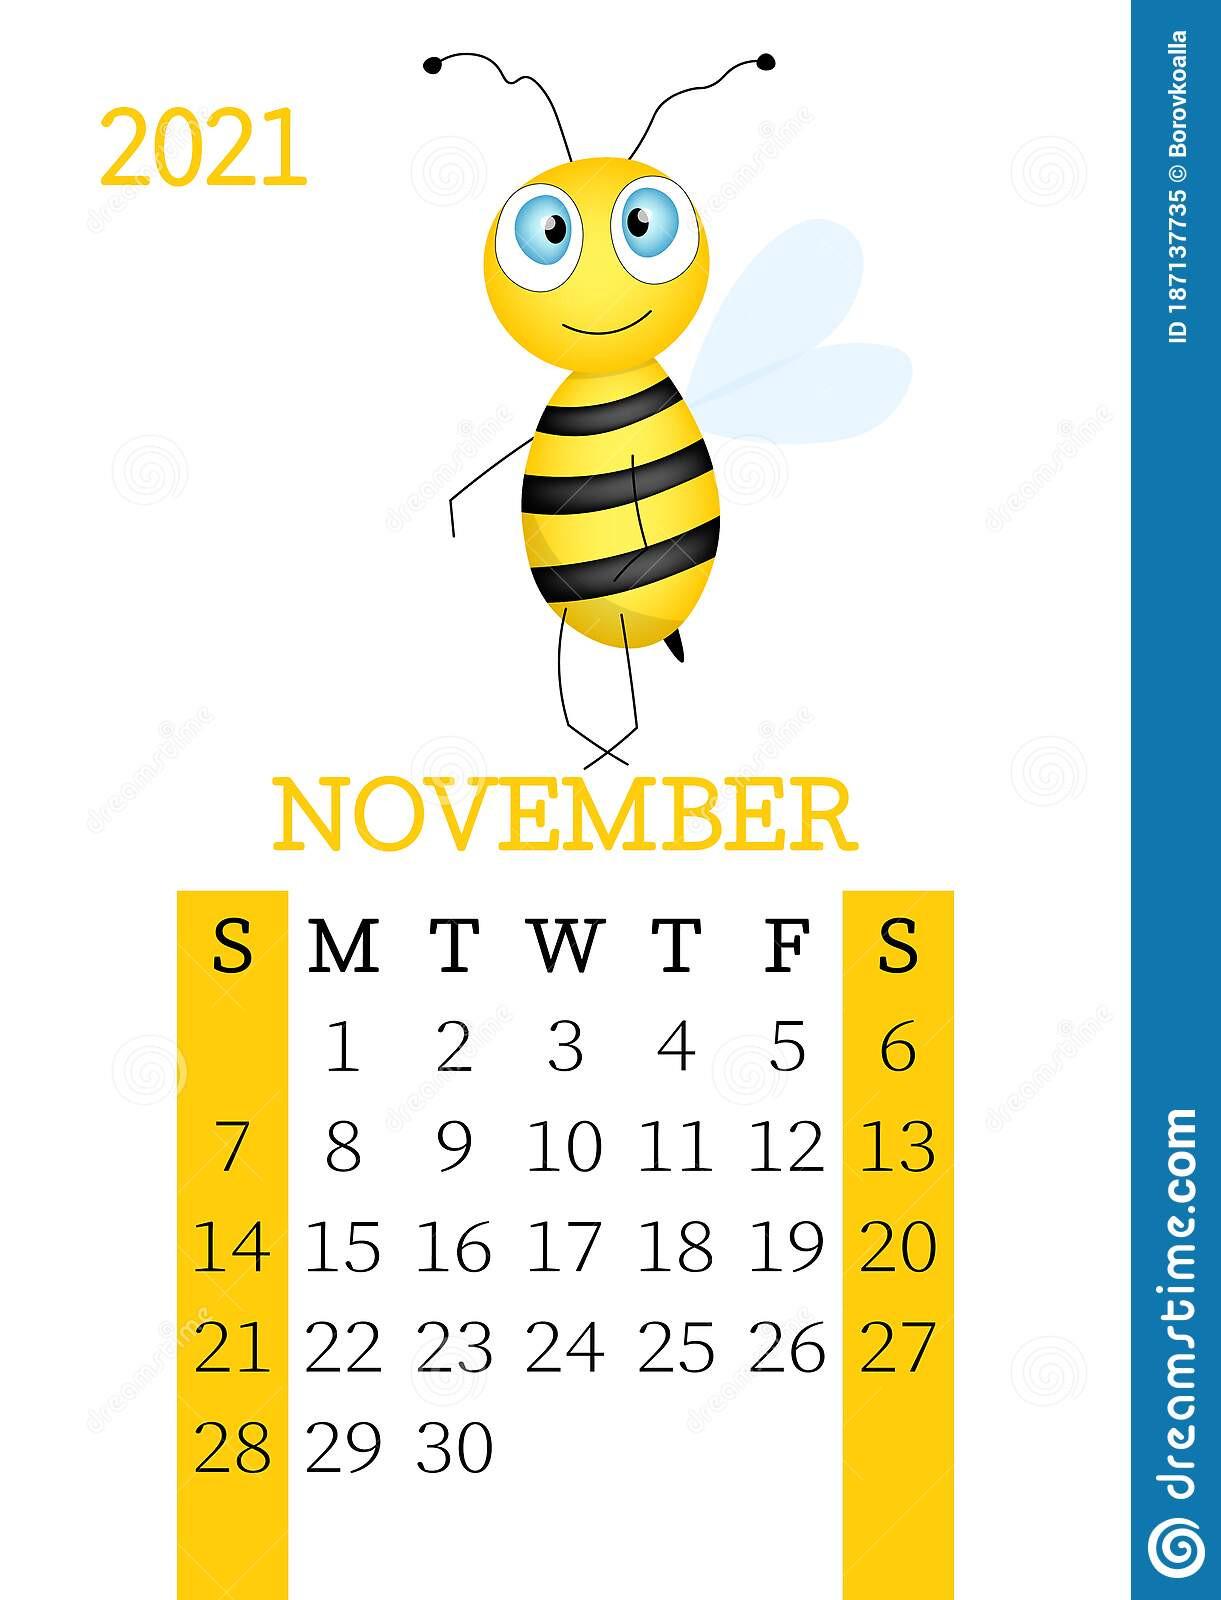 Calendar 2021. Monthly Calendar For November 2021 From-Calendar 2021 Sat Thru Sunday